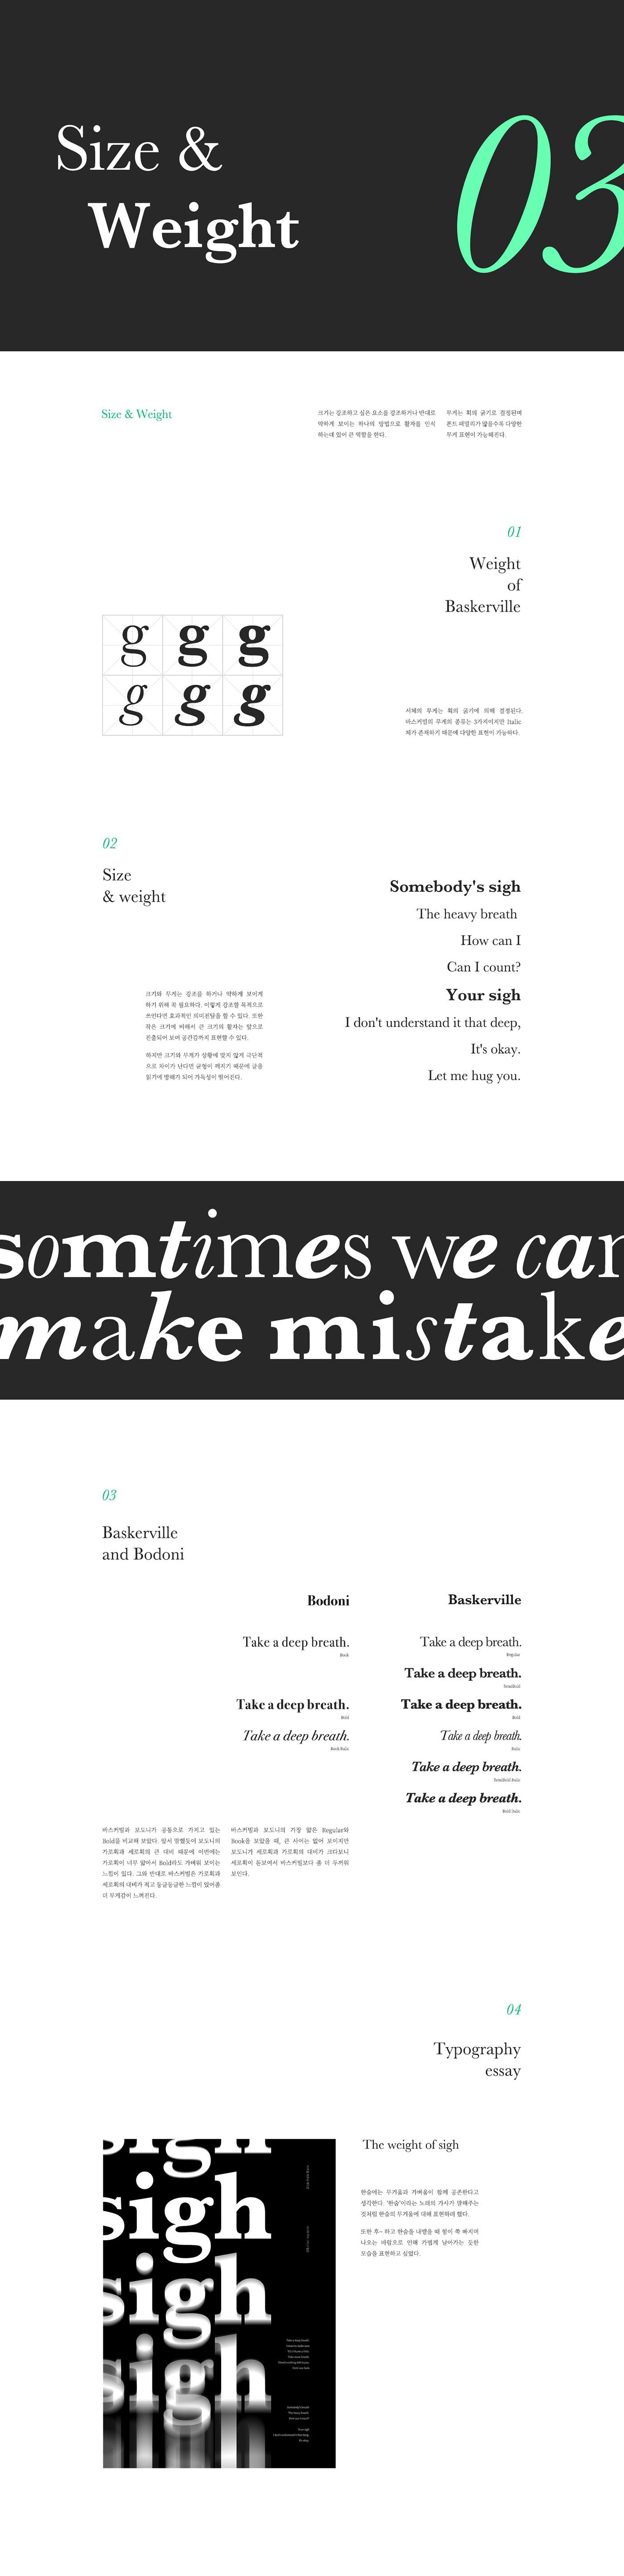 Typography dissertation child labour essay writing